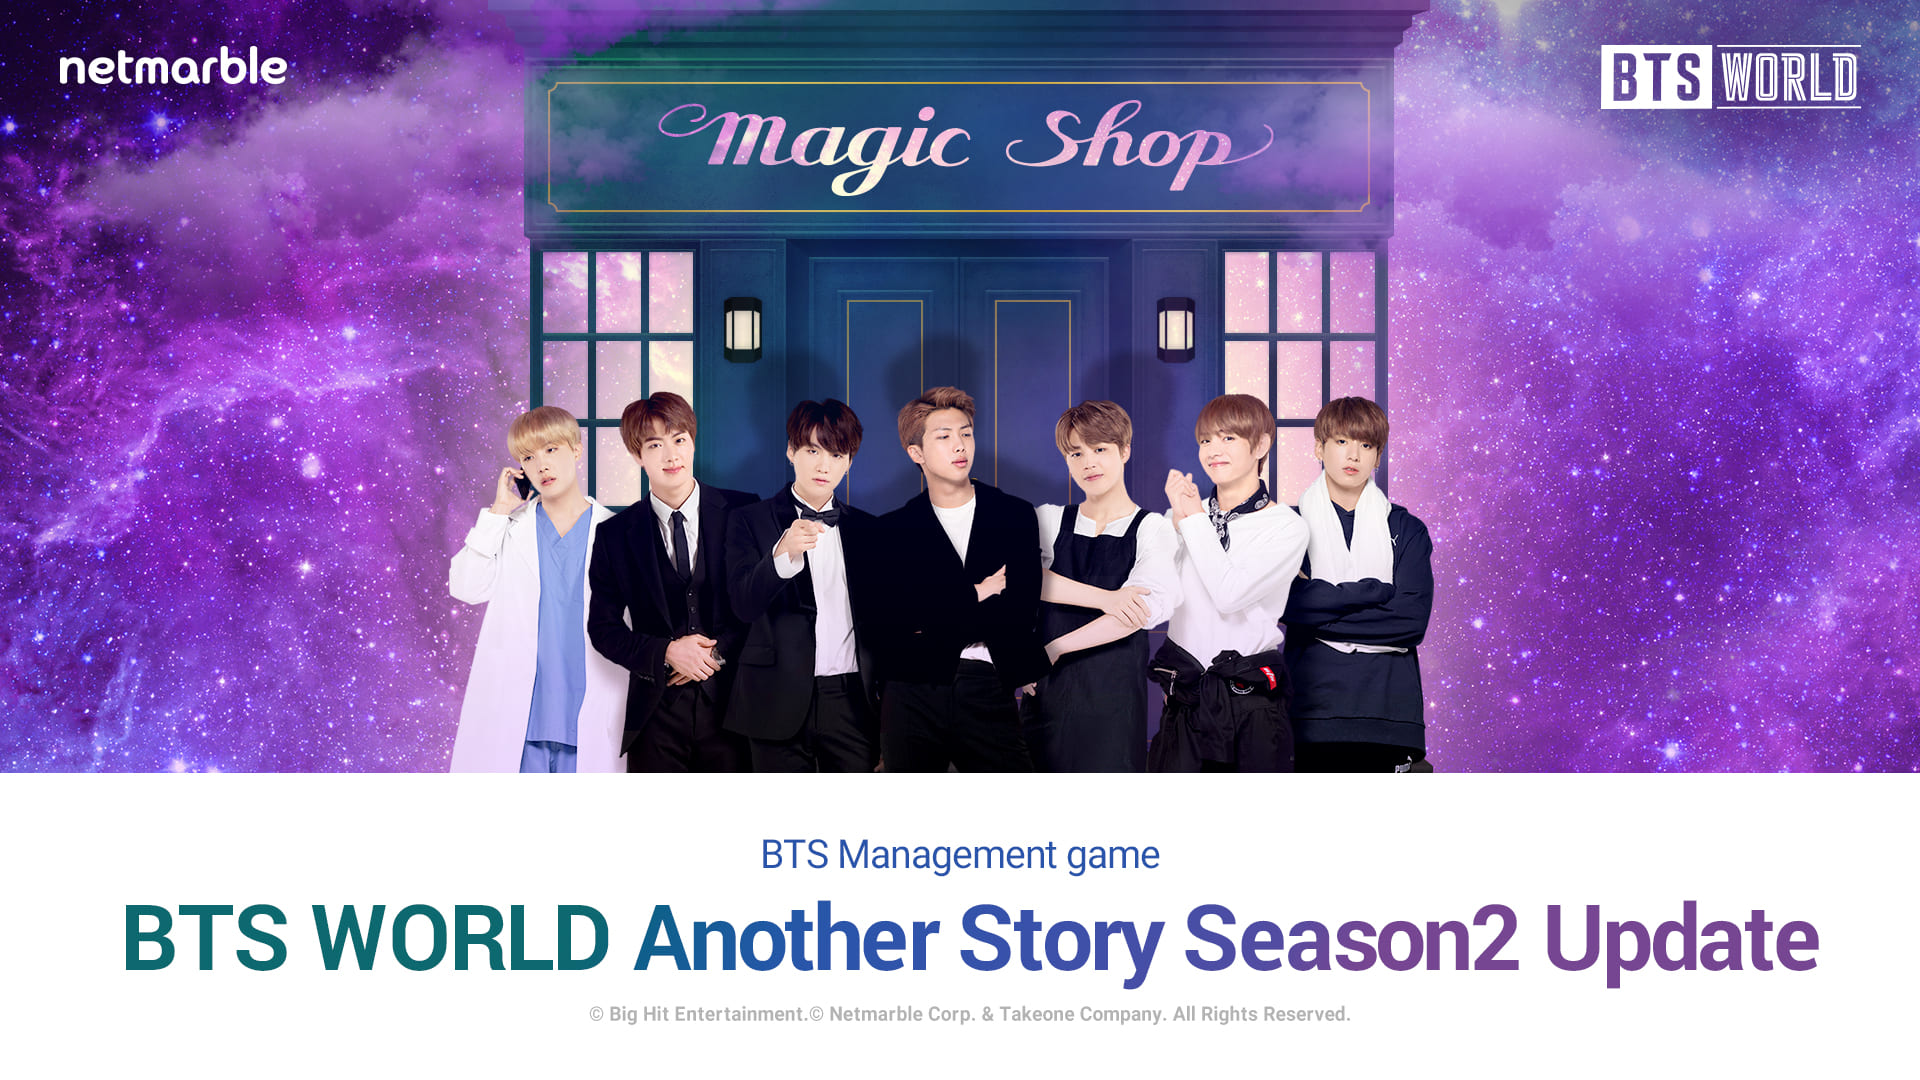 《BTS WORLD》推出三月更新  防彈少年團拜訪Magic Shop